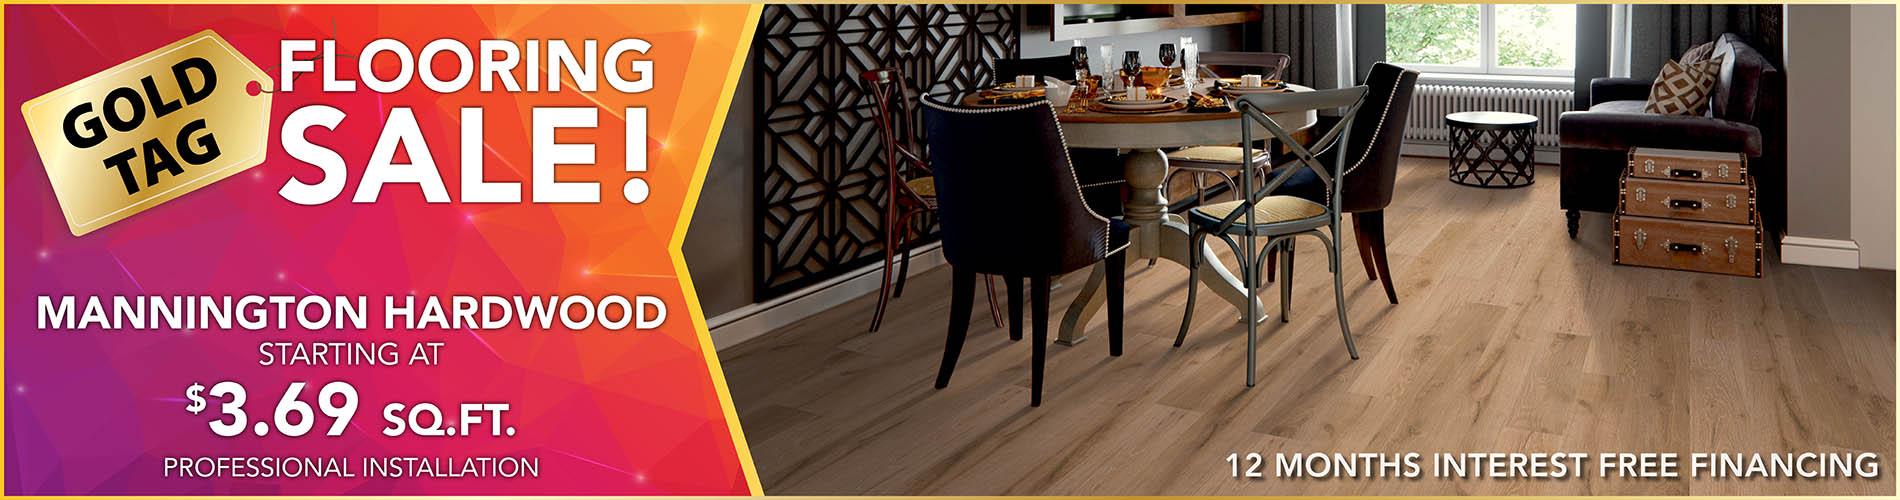 National Gold Tag Sale Mannington Hardwood Flooring $3.69 Sq.Ft.